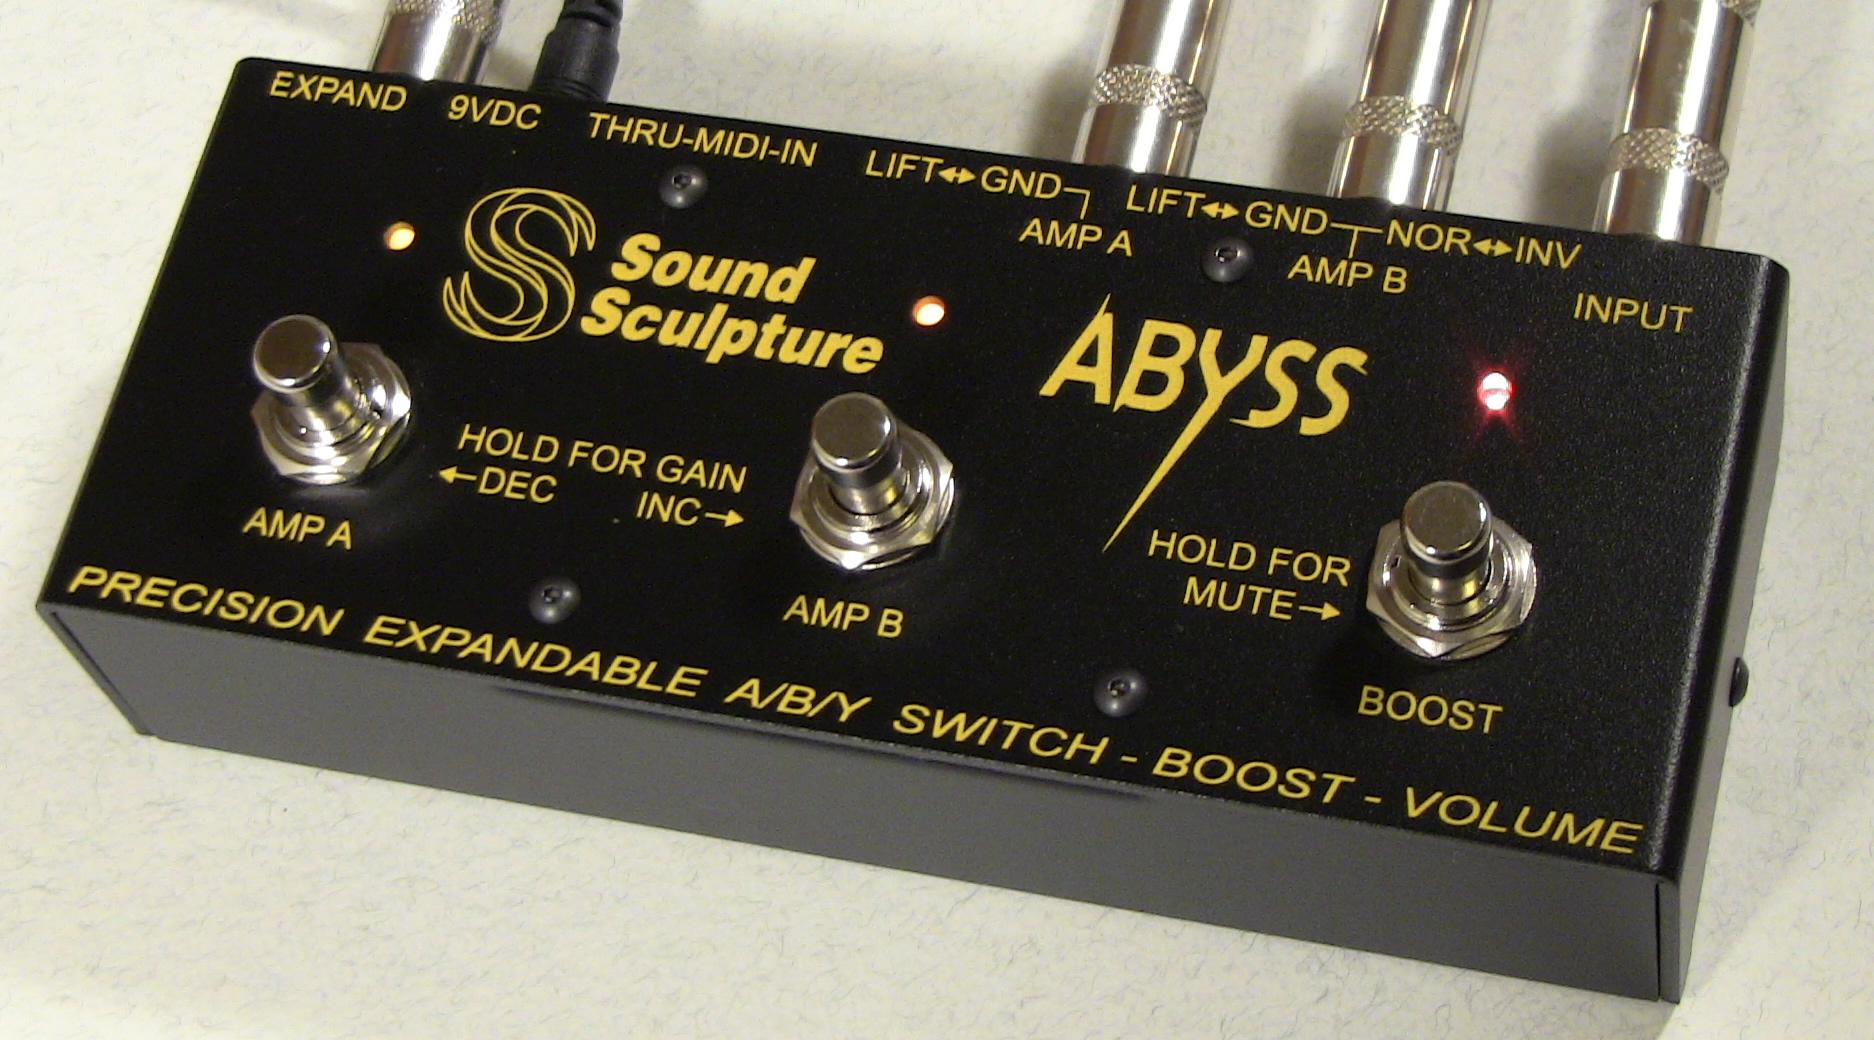 ab box - Abyss